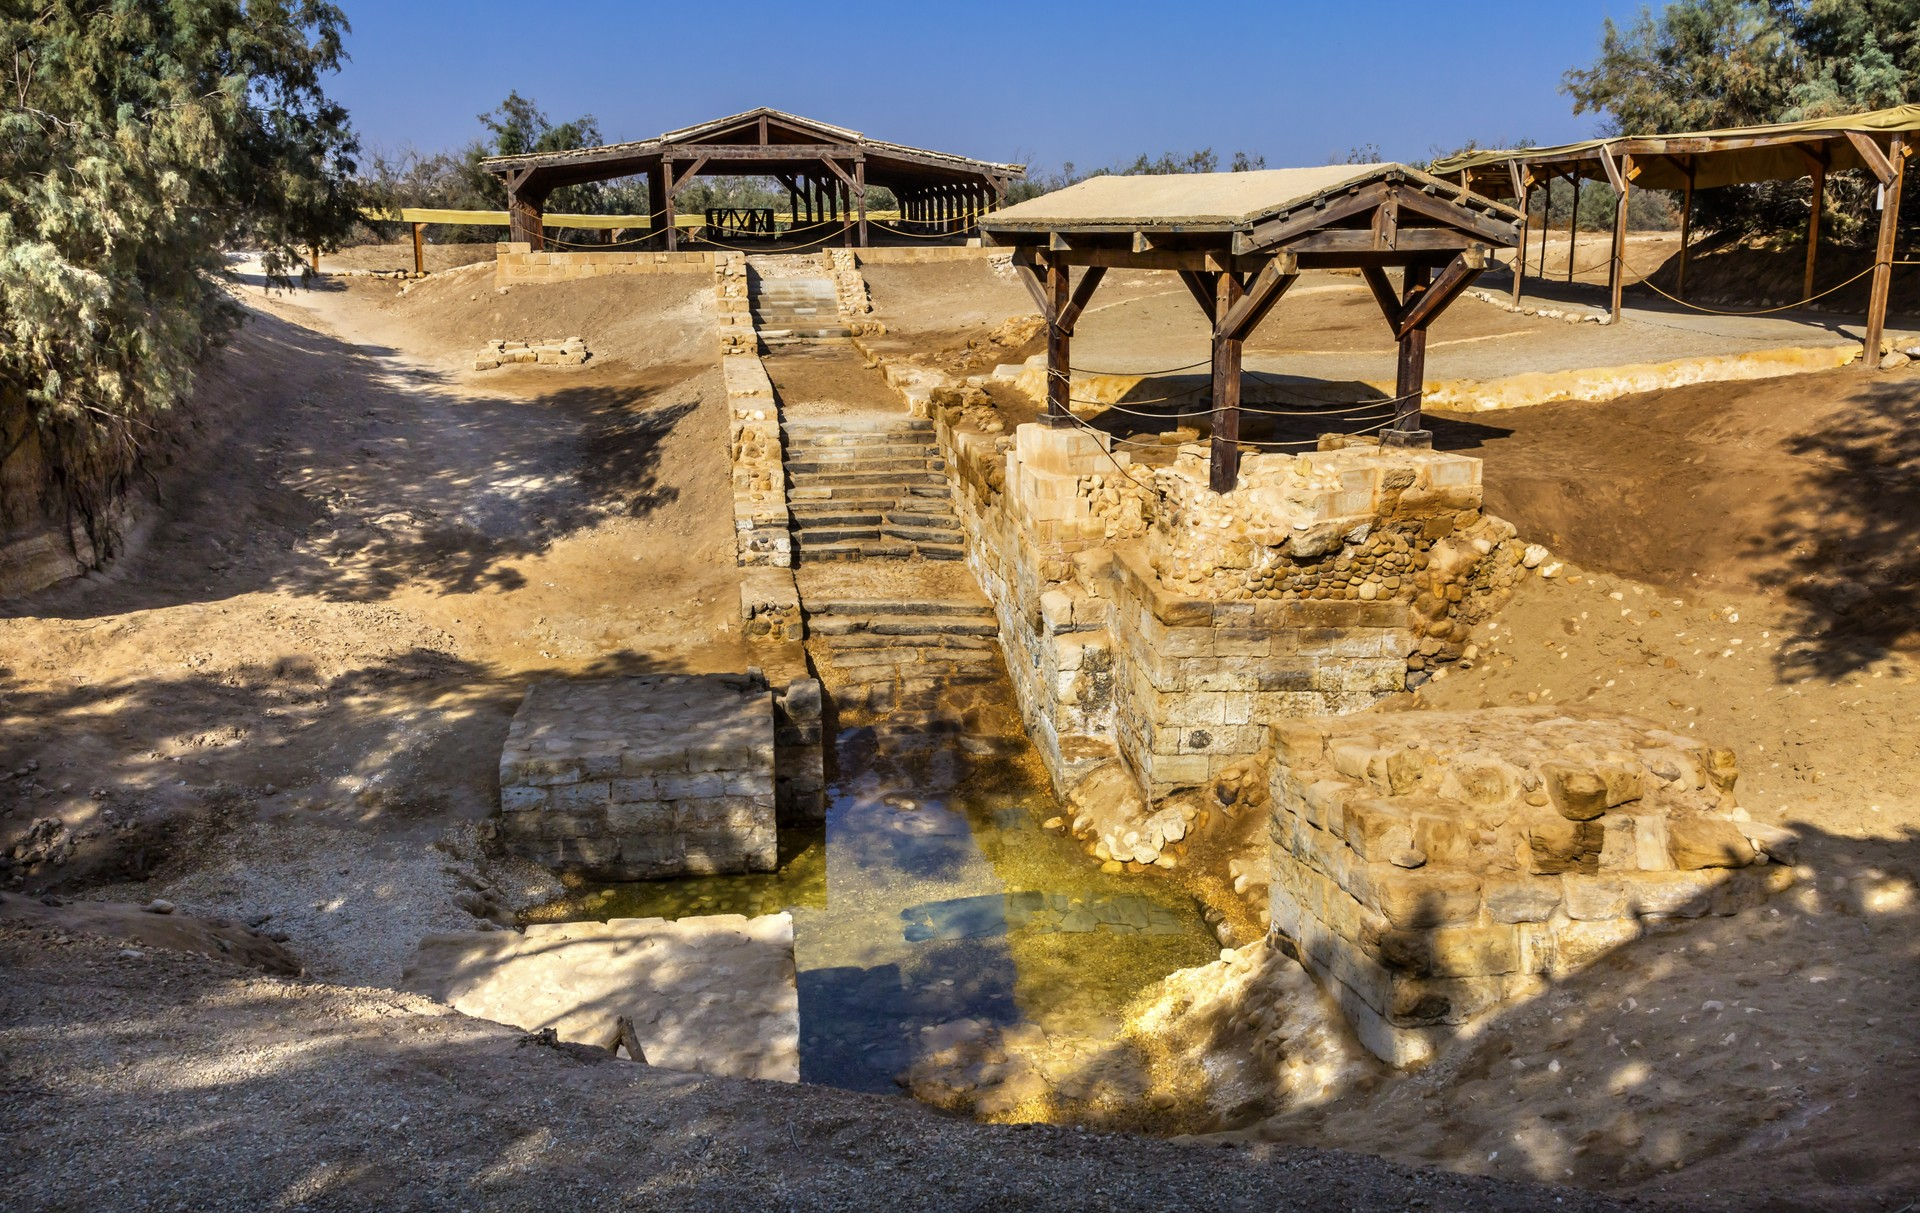 Bethany in Jordan: the site of Jesus' baptism